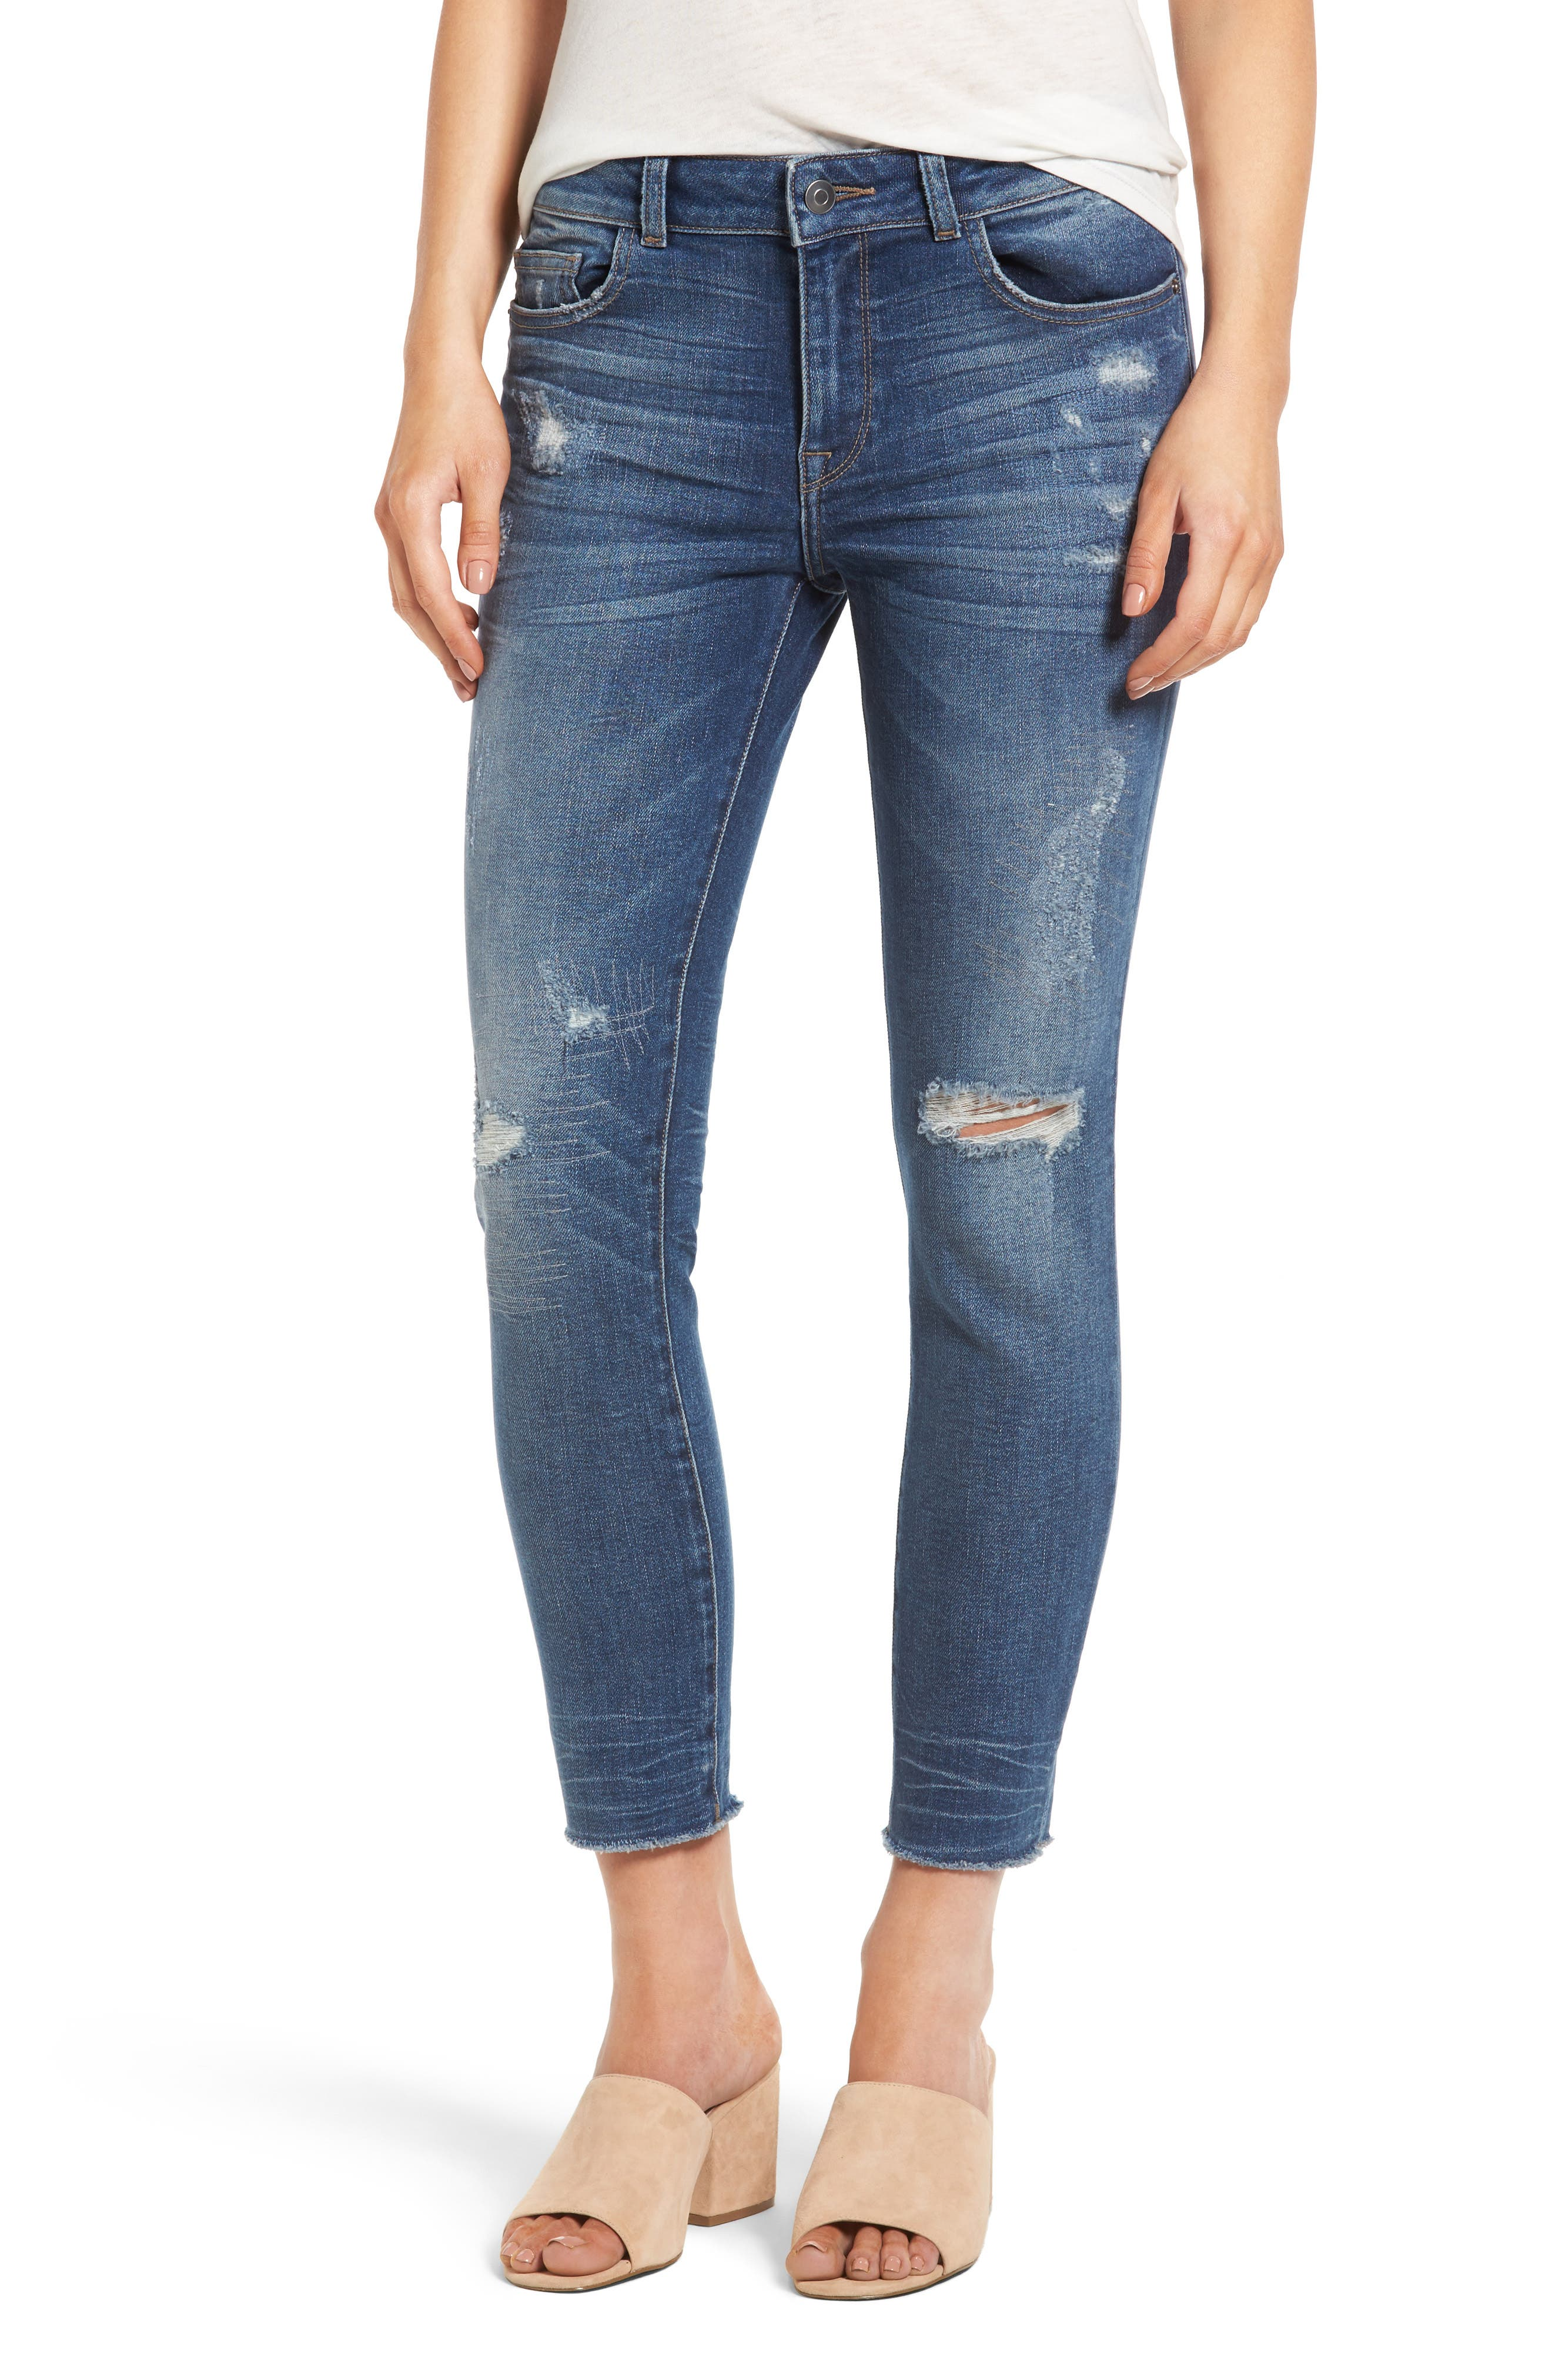 DL1961 Florence Crop Skinny Jeans (Uptown)